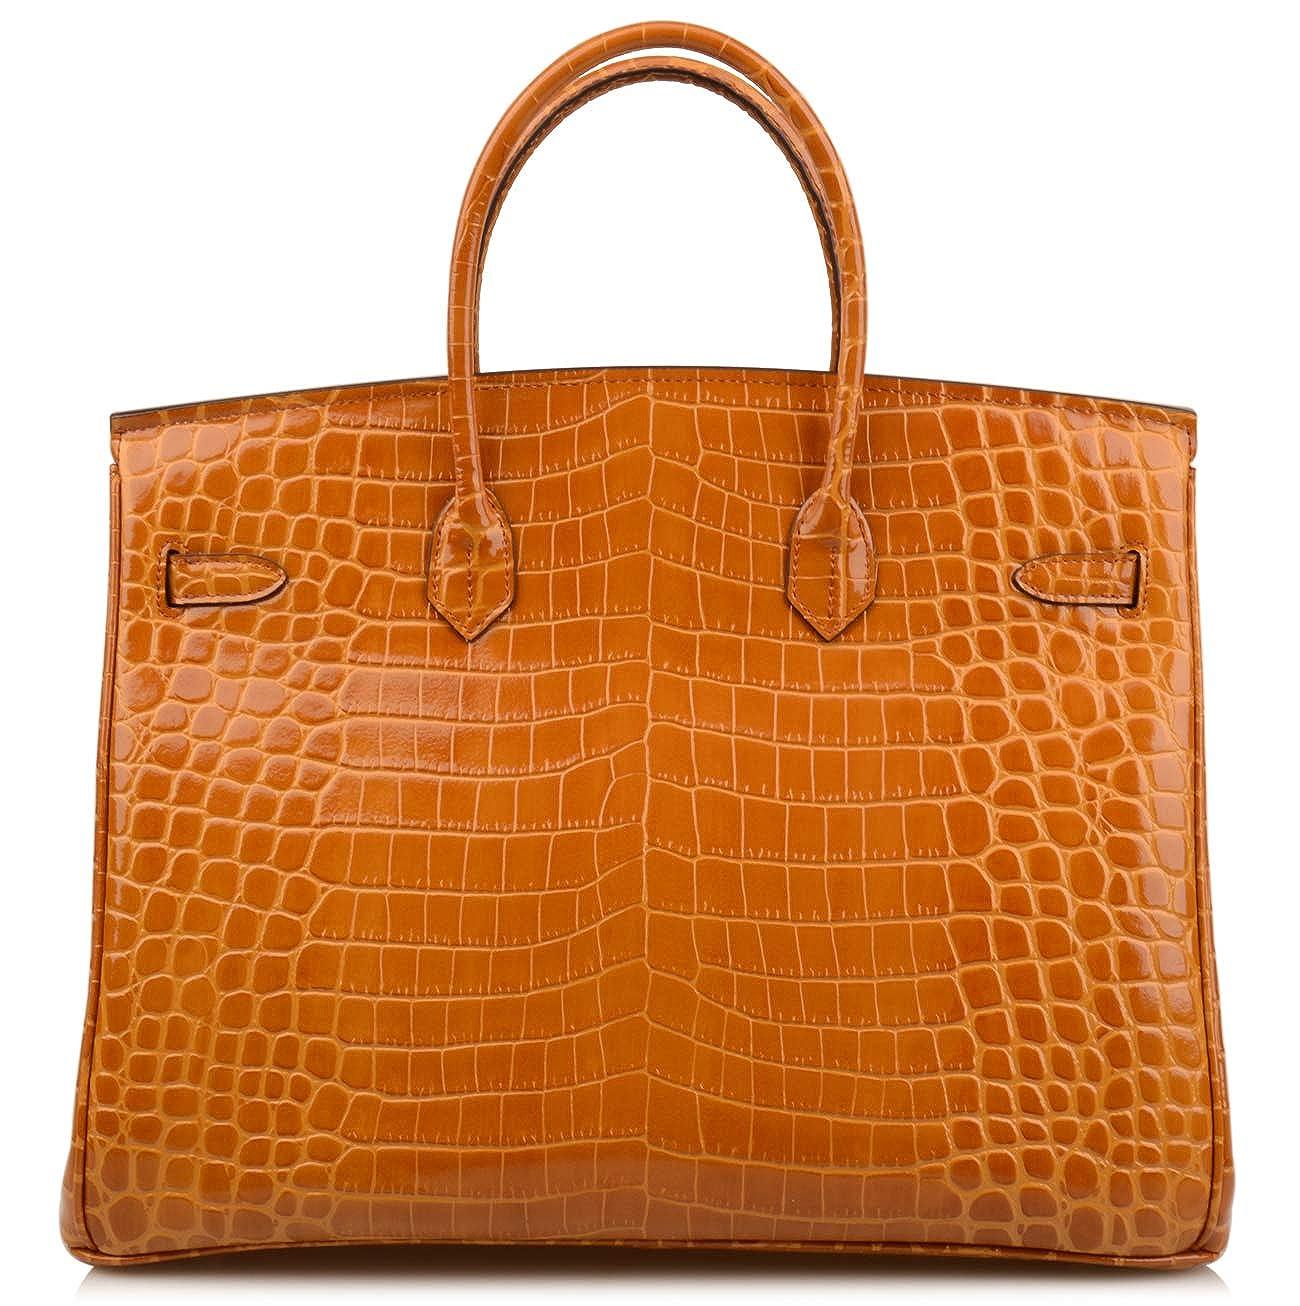 3d680bbd93d Amazon.com  NEW ARRIVAL Ainifeel 40cm Oversized Patent Leather Padlock  Handbag laptop purse Business Handbags (40cm OVERSIZE